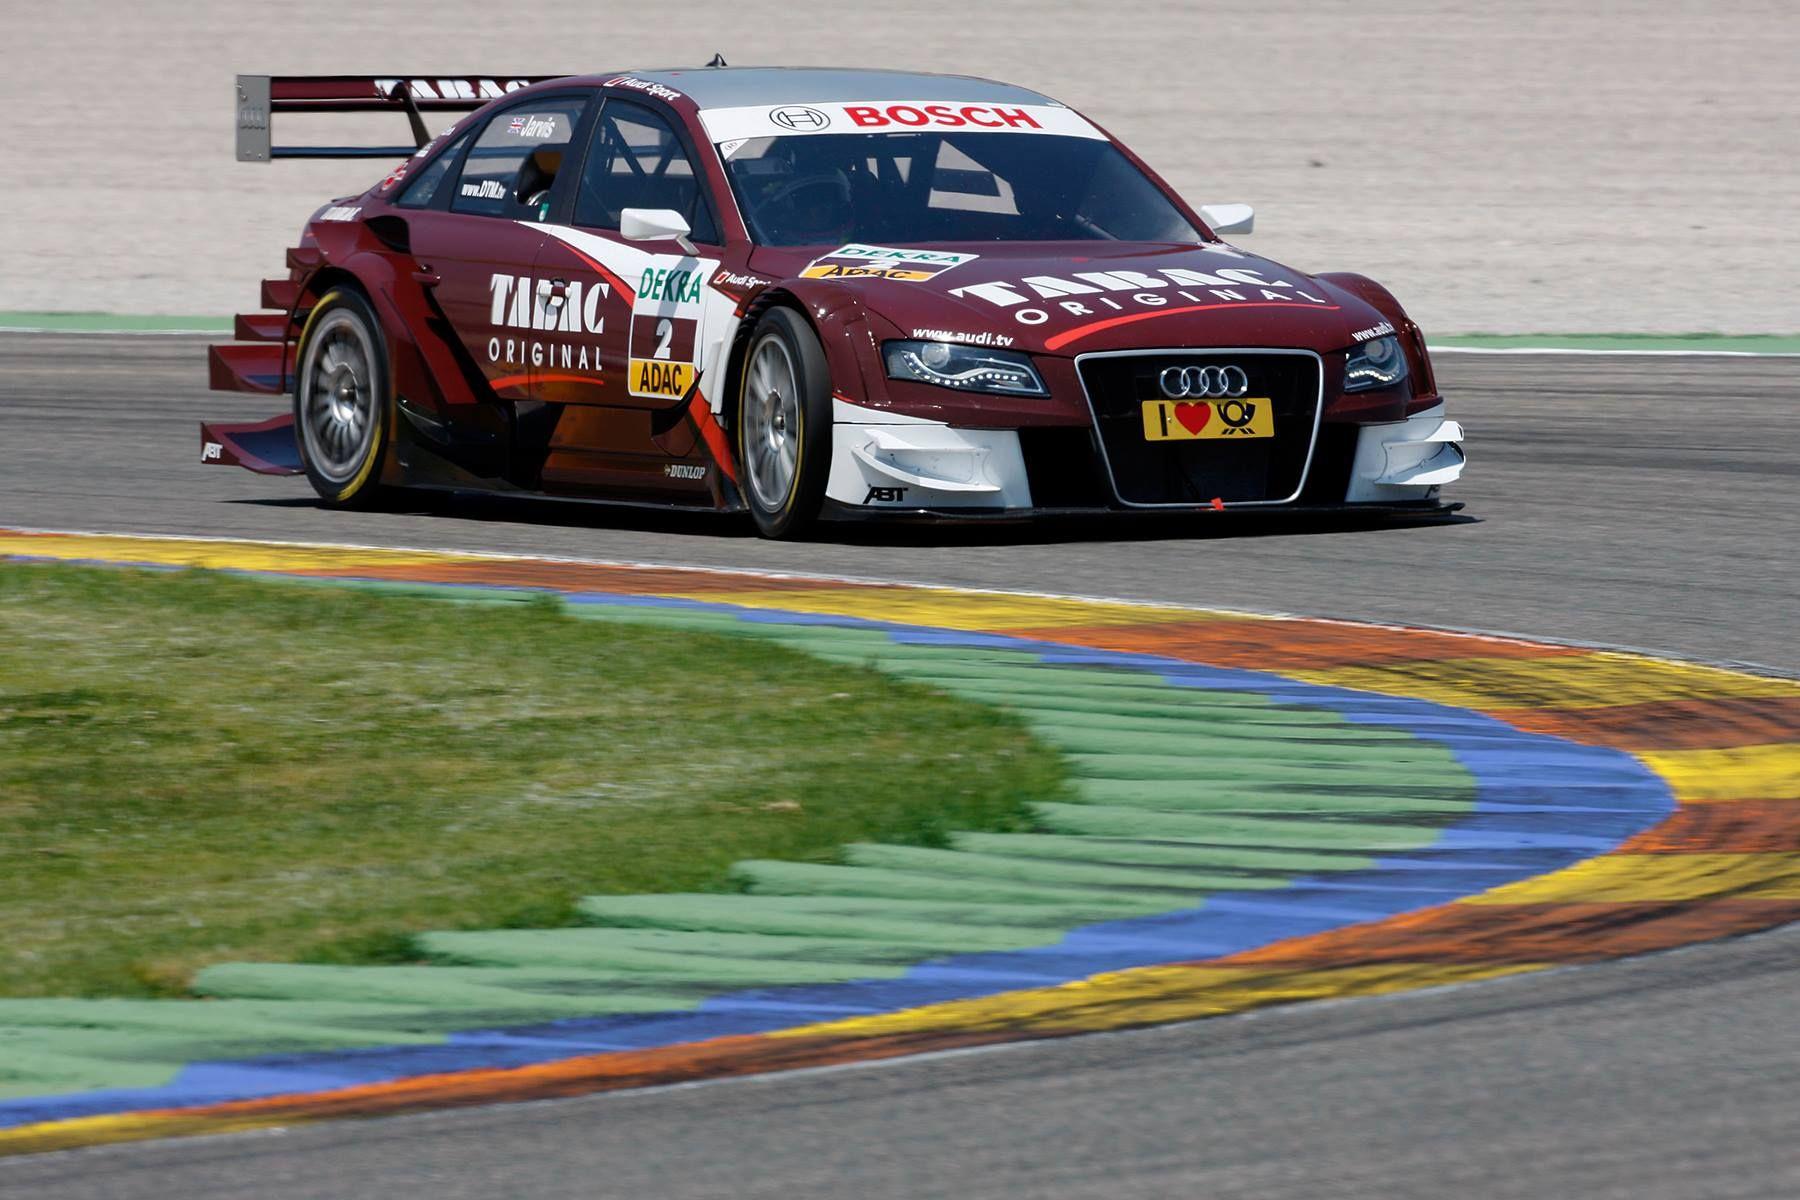 Valencia 2010 Cars series, Touring, Racing